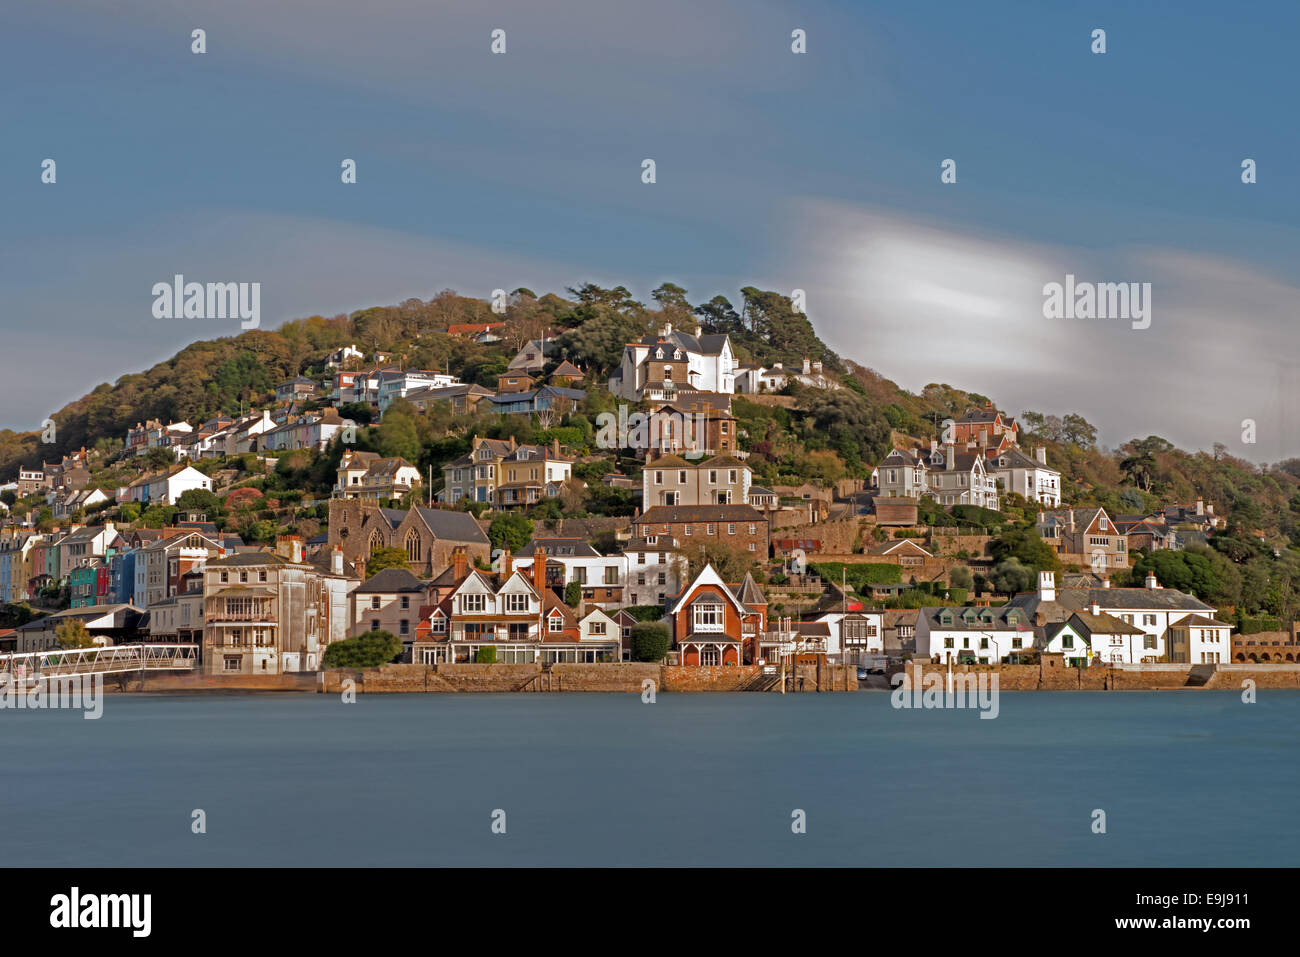 Blick auf Kingswear aus Dartmouth, Devon, England, Uk Stockbild